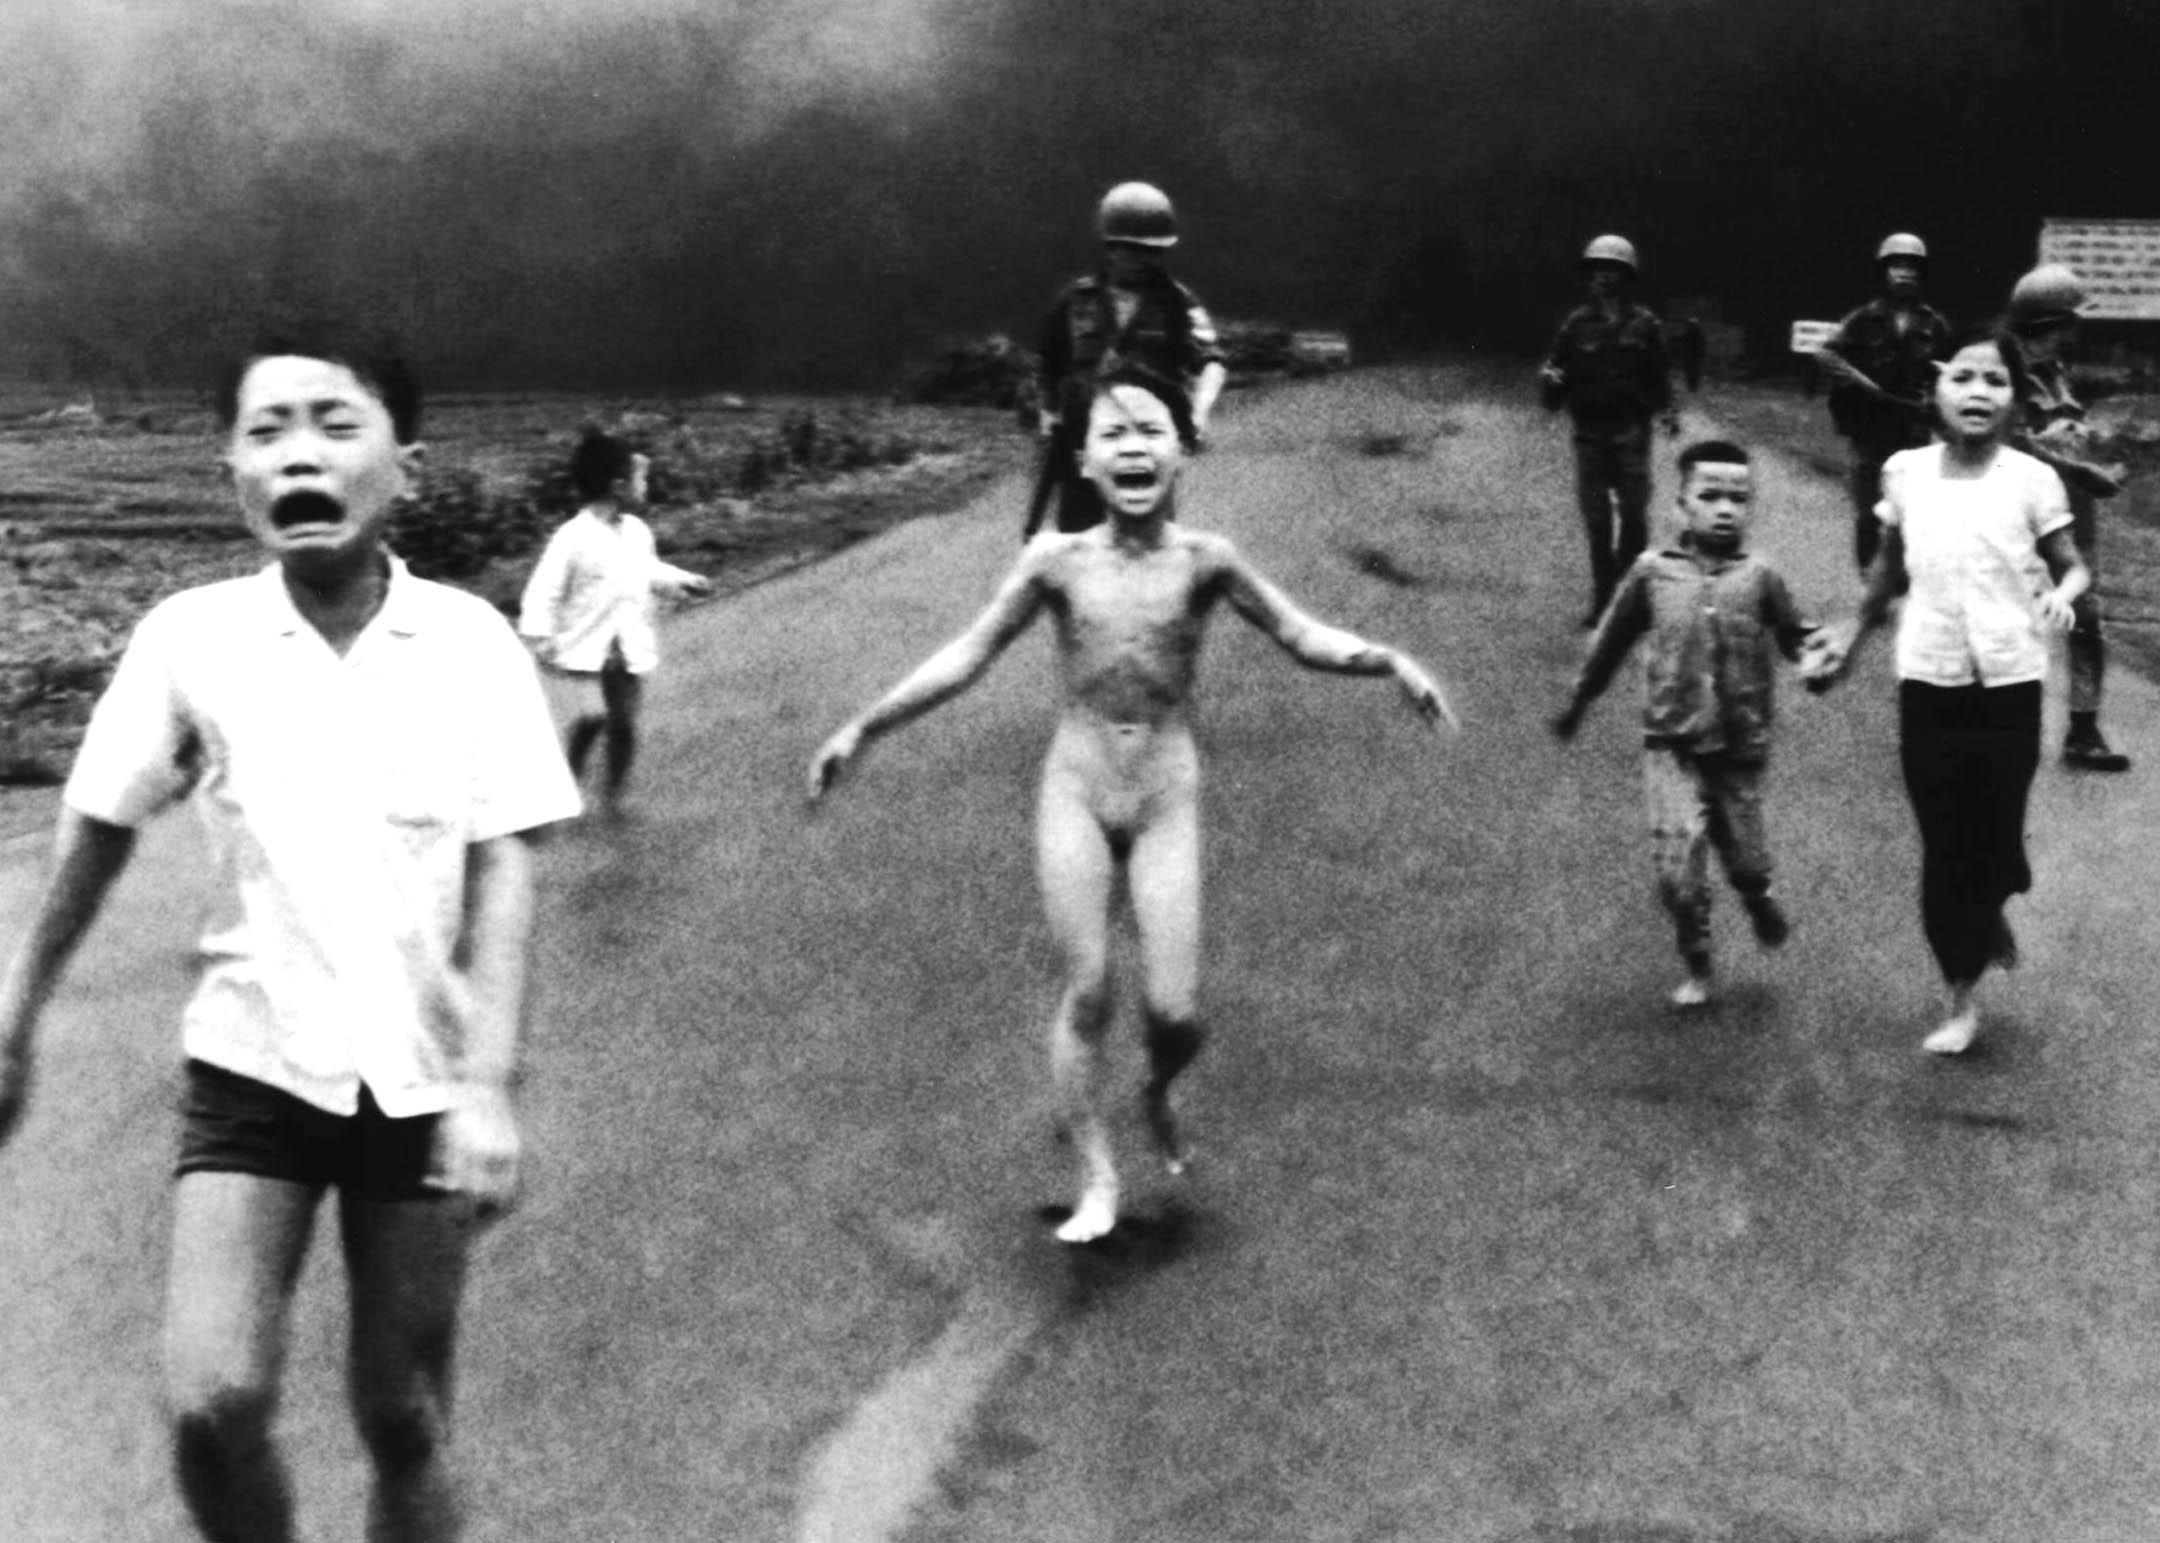 Menina vietnamita correndo nua após o bombardeio de sua vila (8 de junho de 1972).